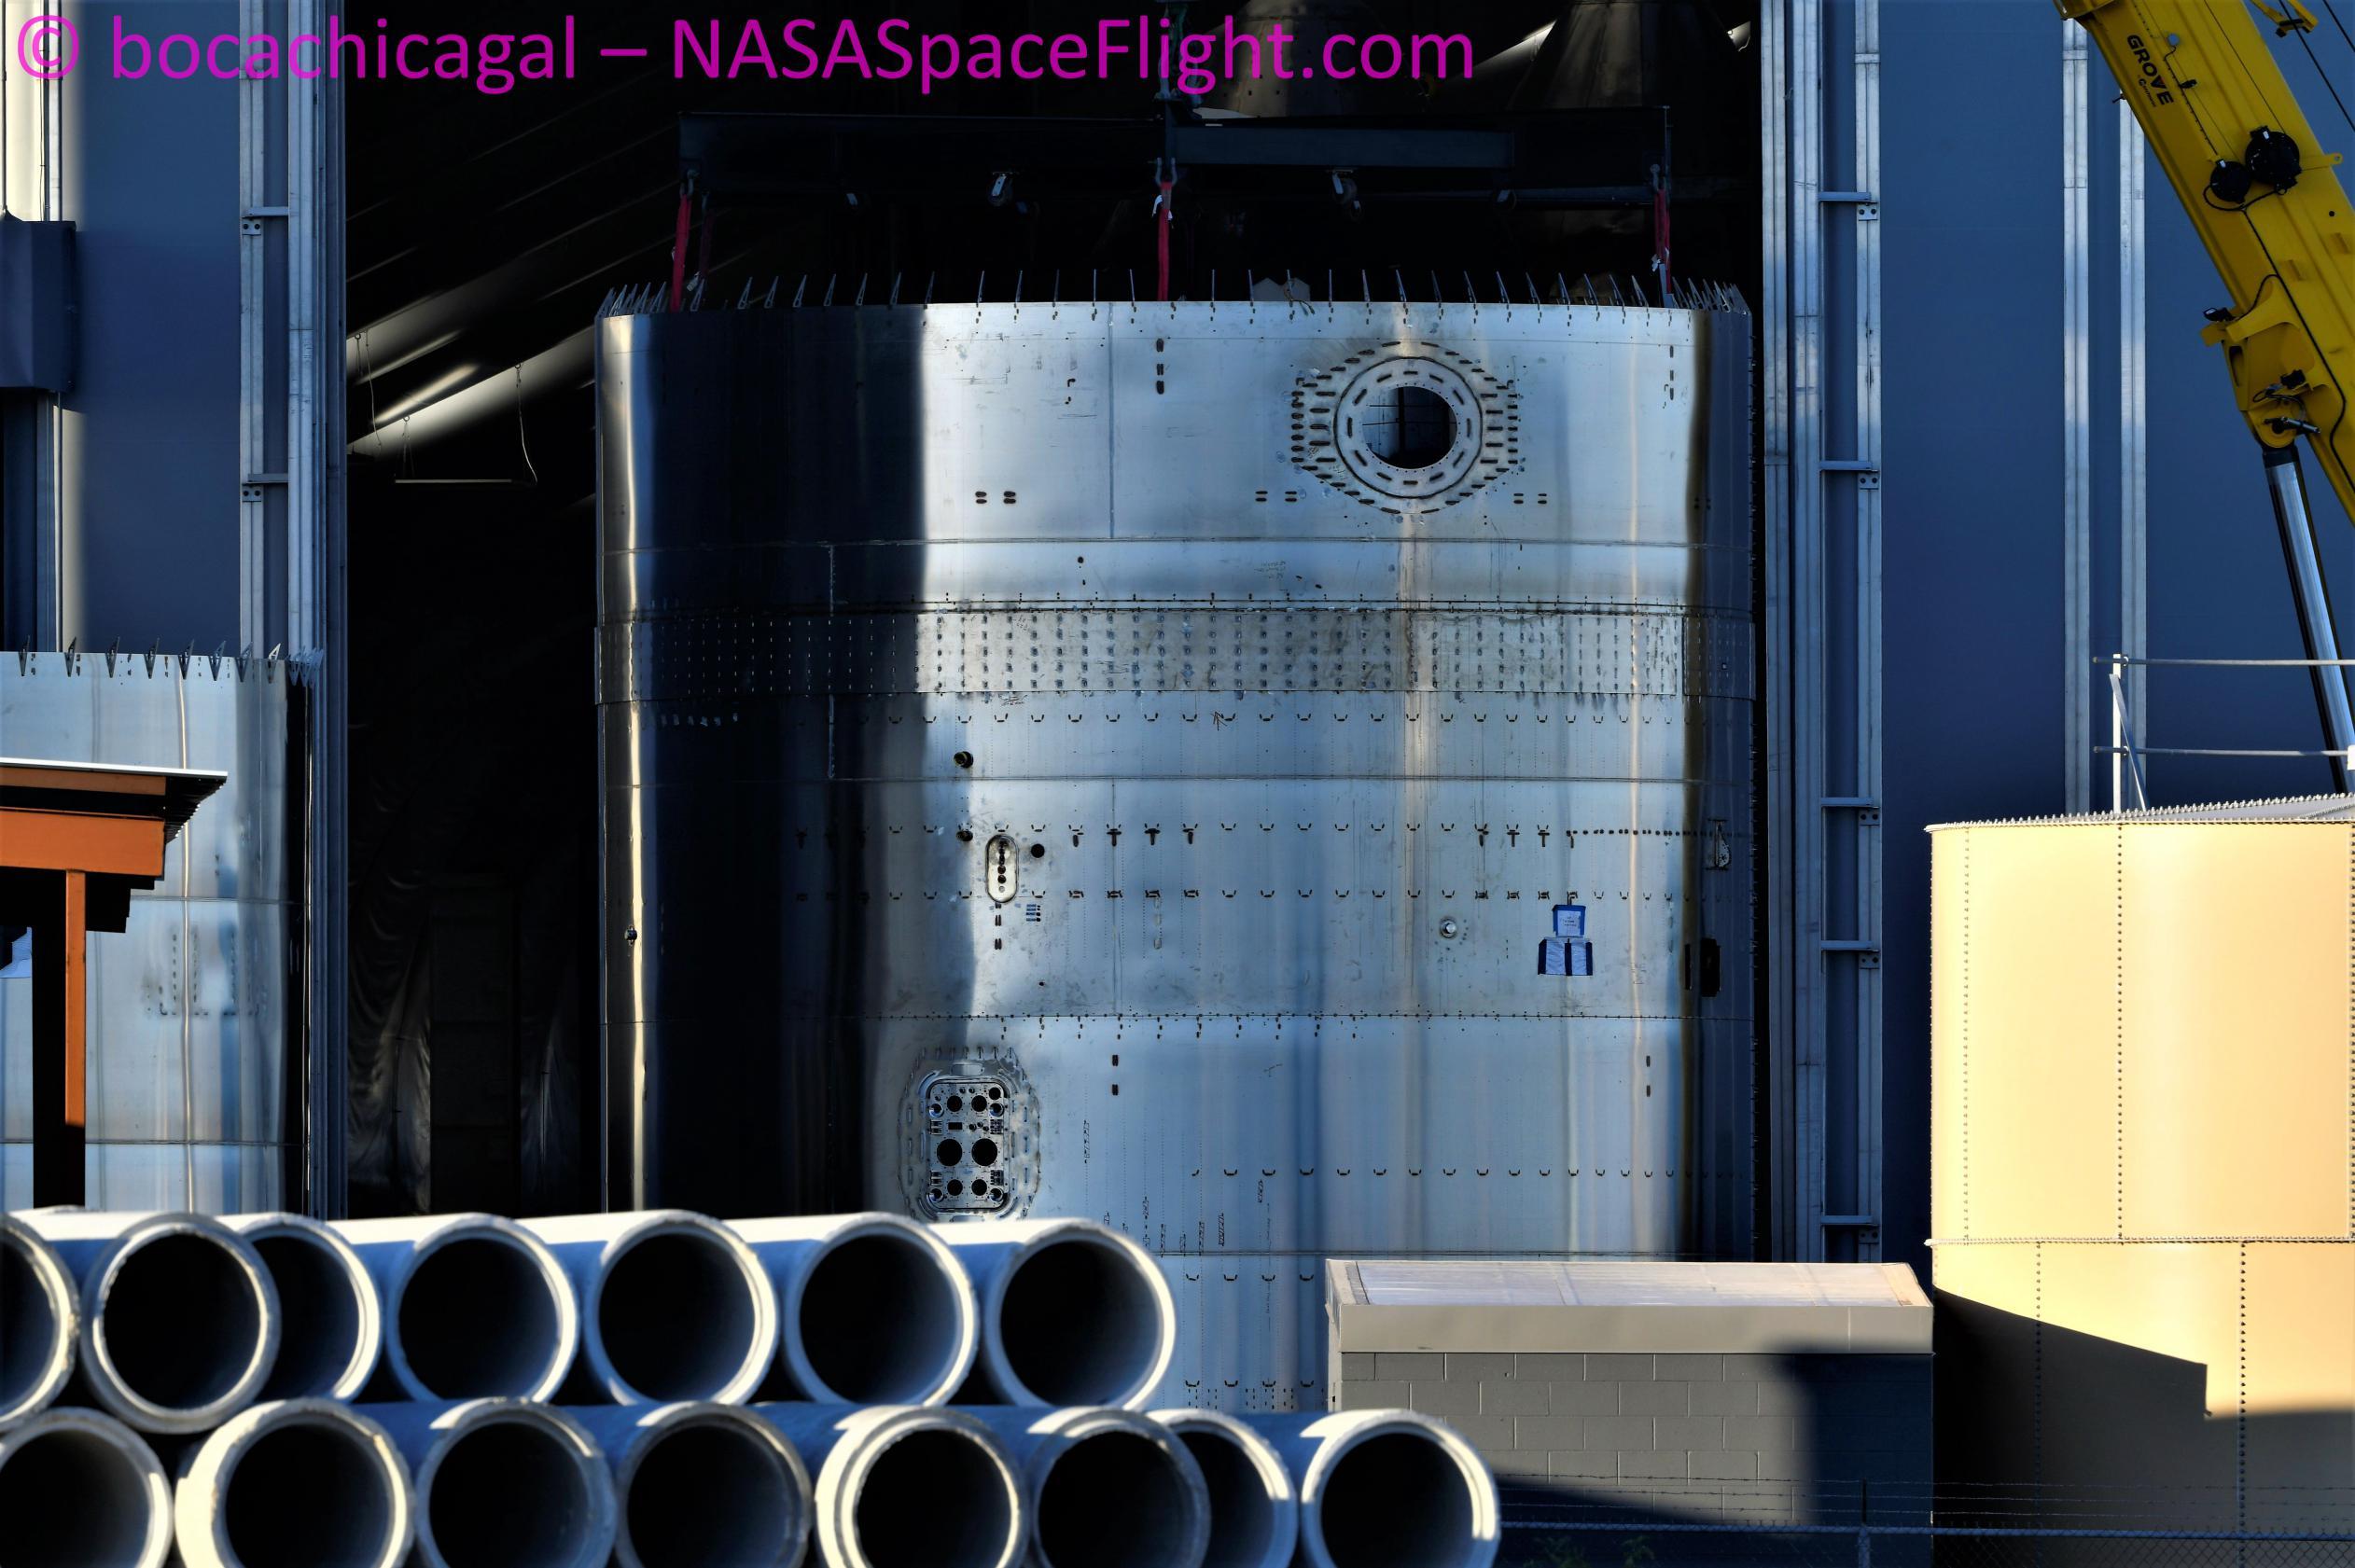 Starbase 092621 (NASASpaceflight – bocachicagal) S21 engine + skirt section 1 (c)